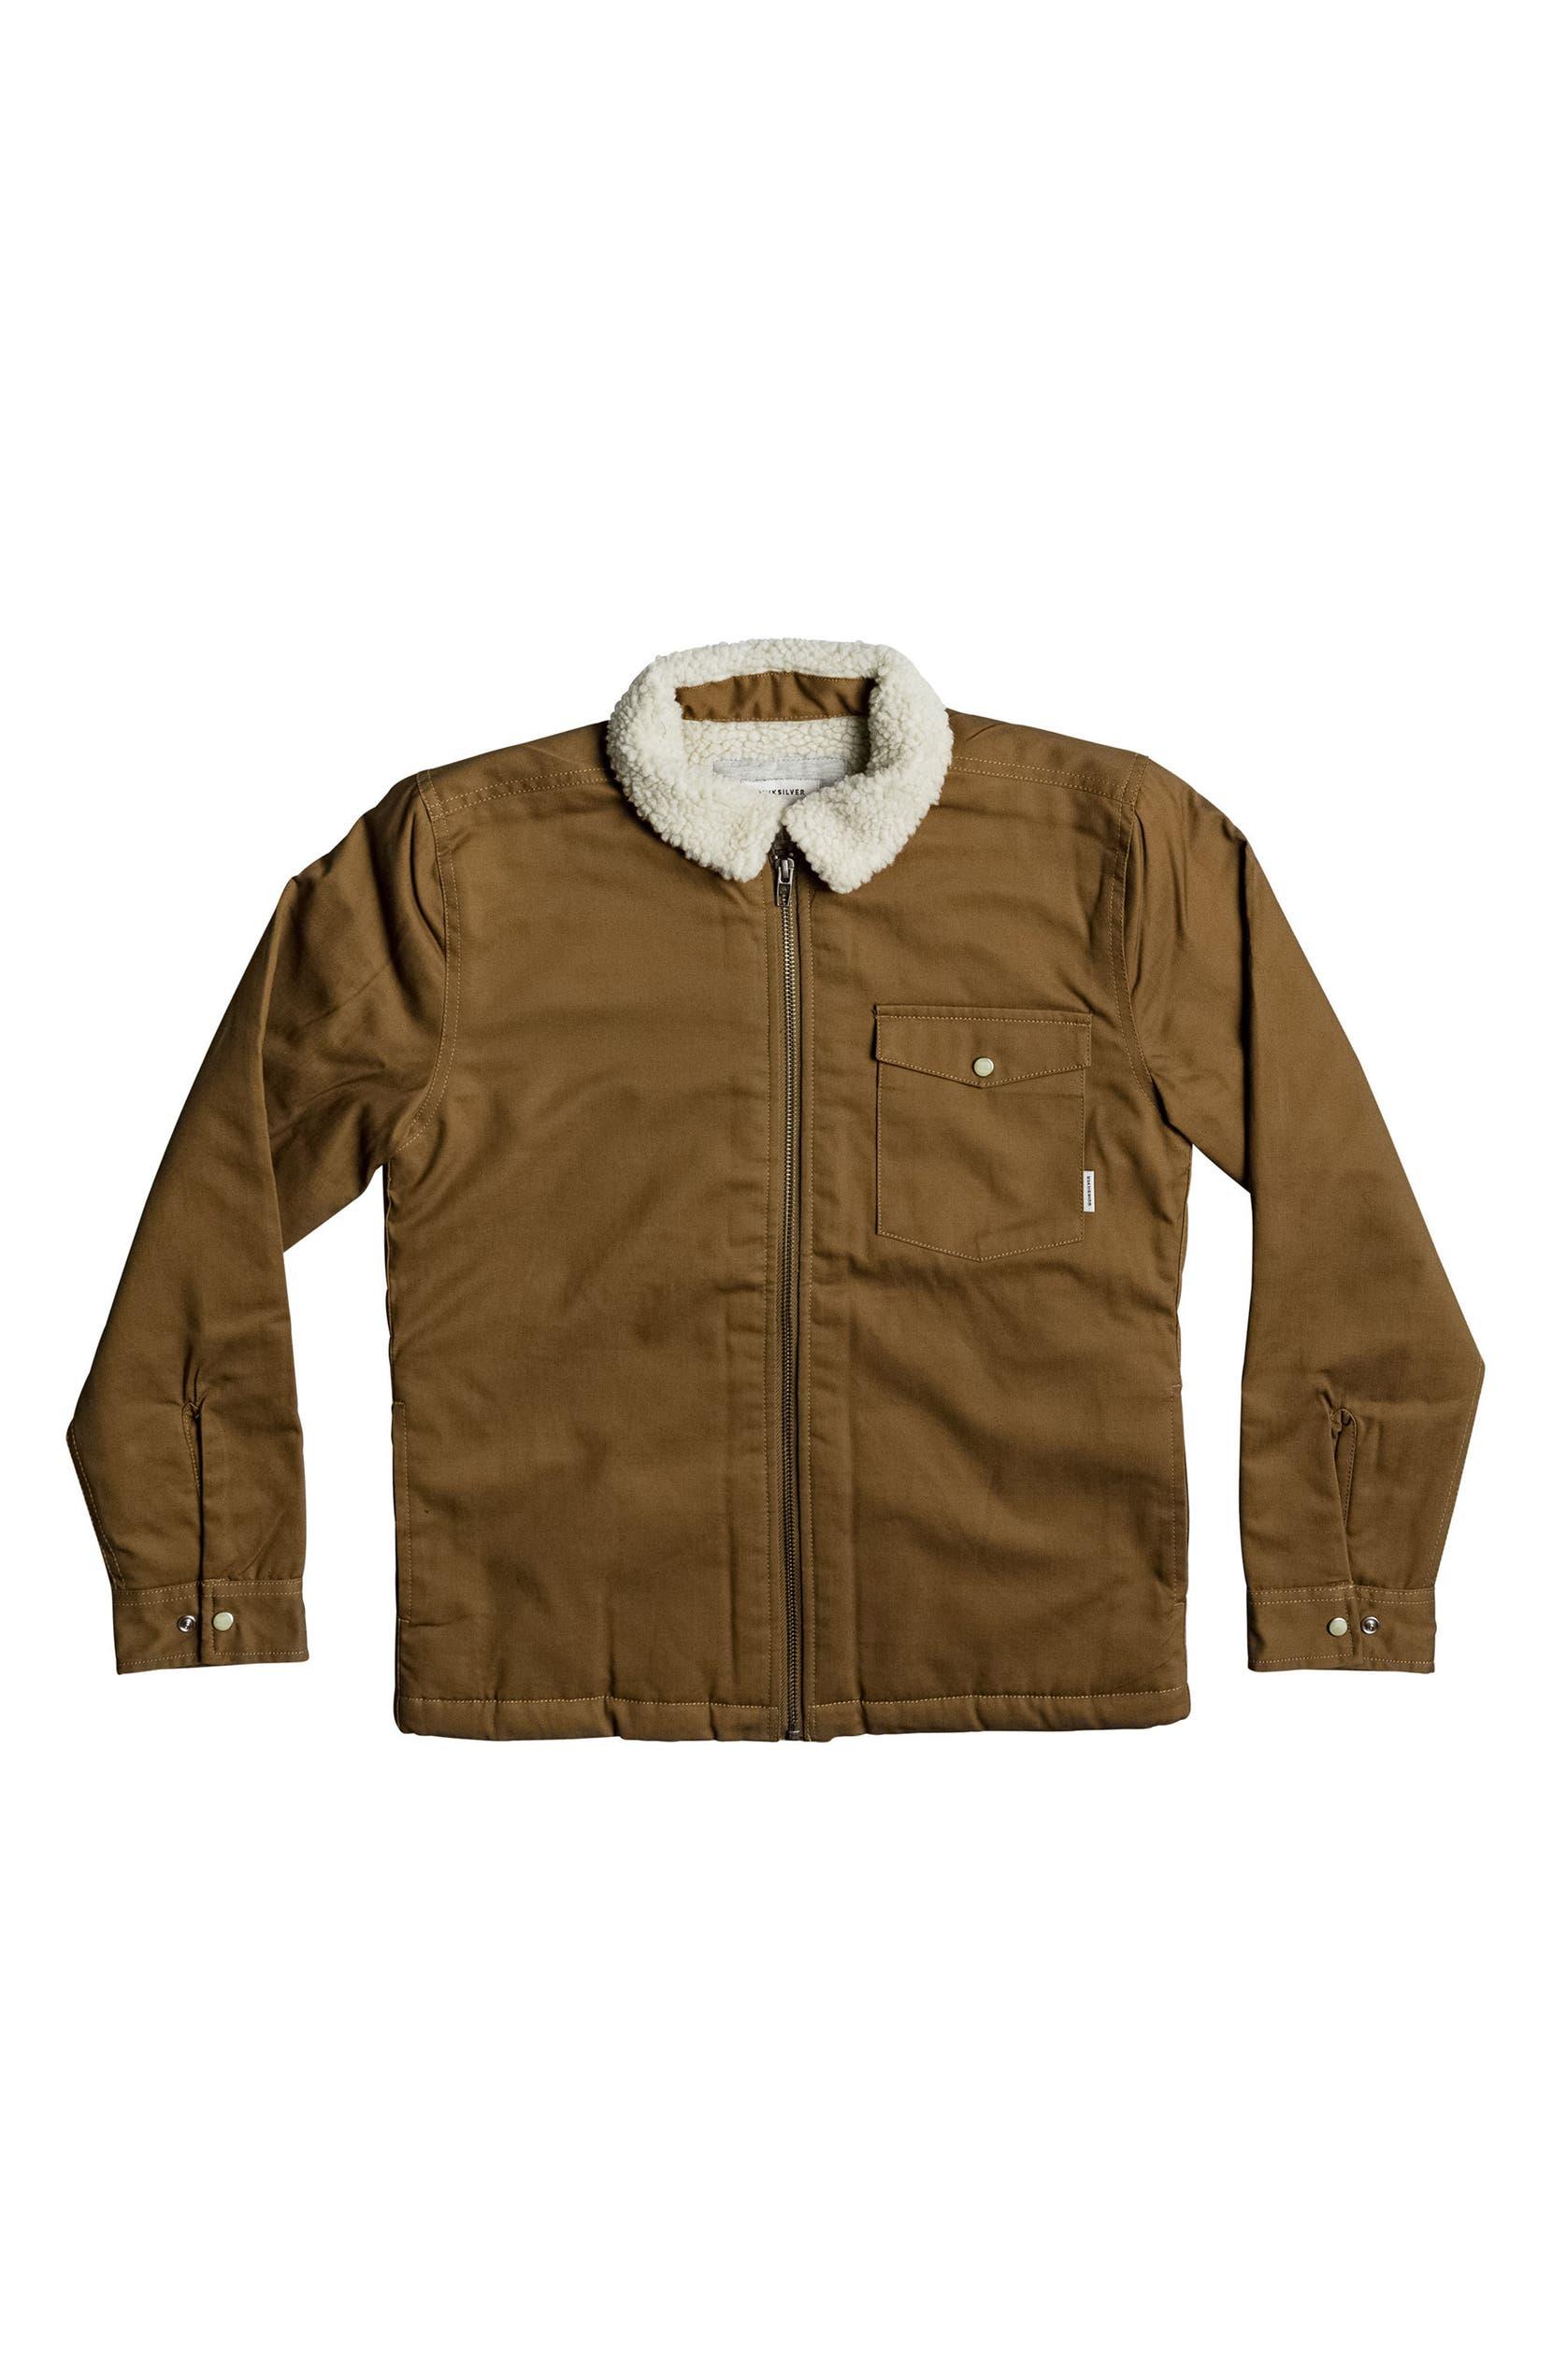 0373c0b2e Quiksilver Dabein Fleece Lined Jacket (Big Boys)